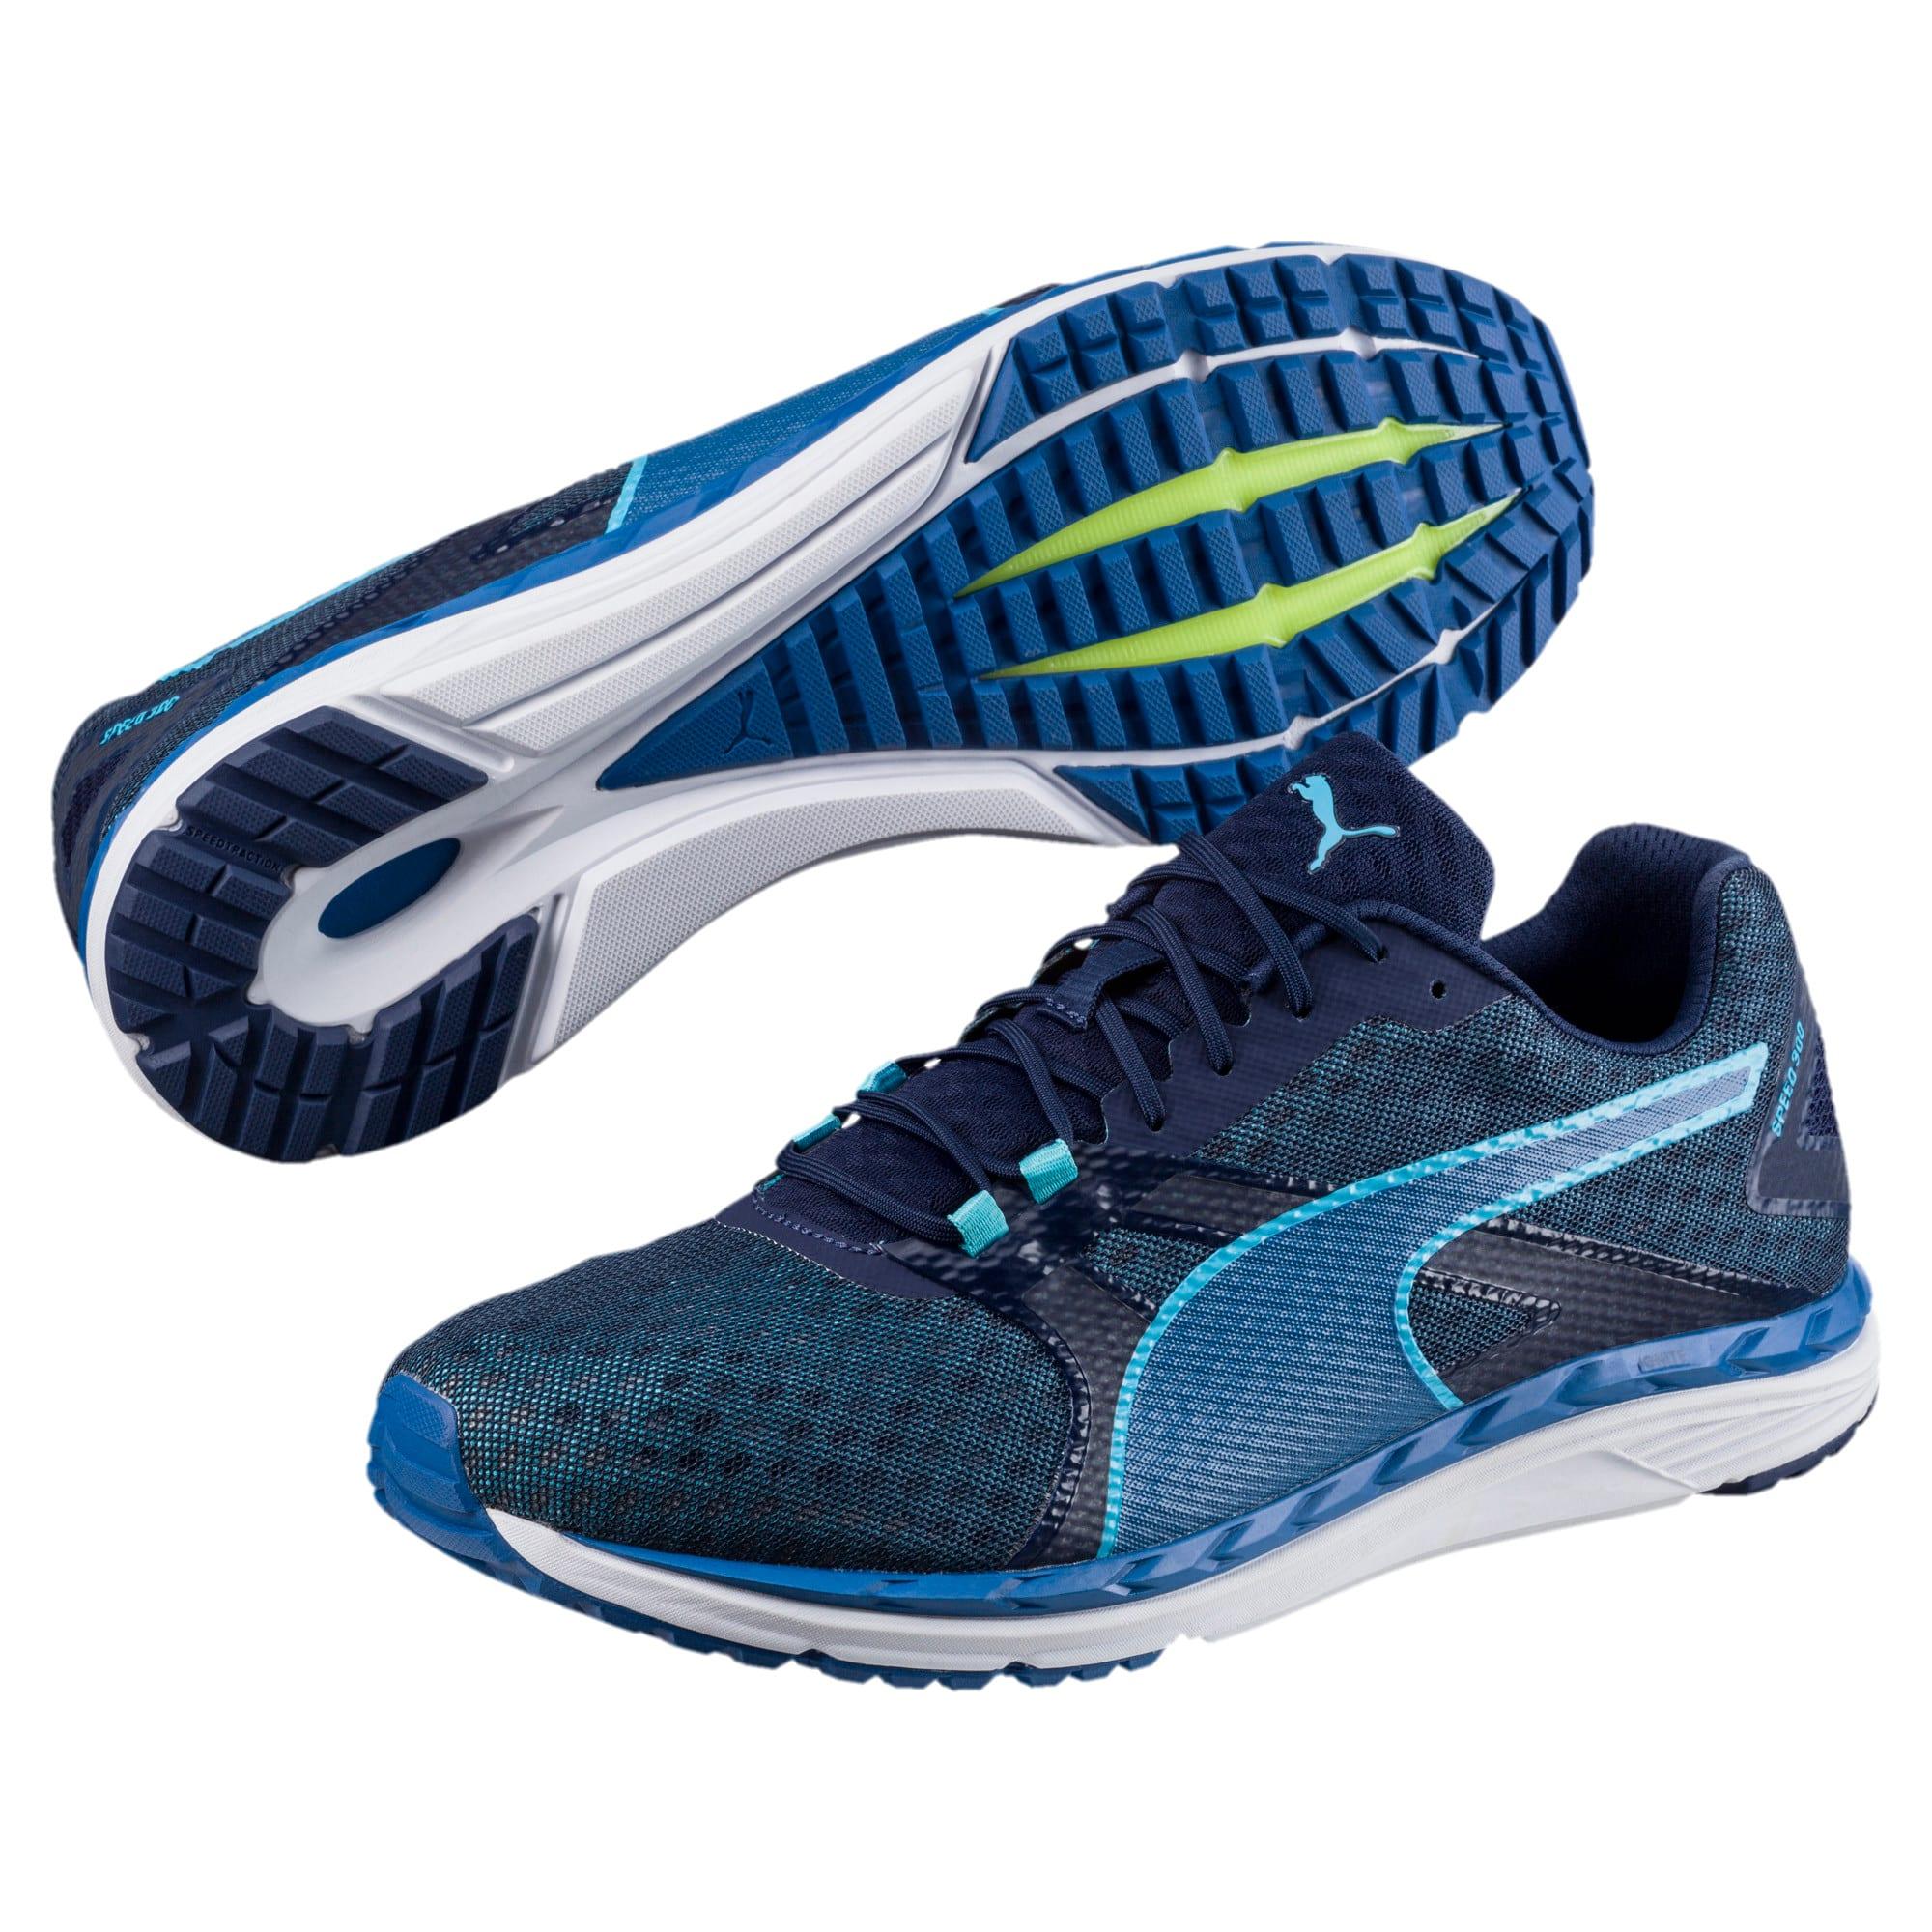 Thumbnail 2 of Speed 300 IGNITE 2 Men's Running Shoes, LapisBlue-BlueDepths-Turq, medium-IND